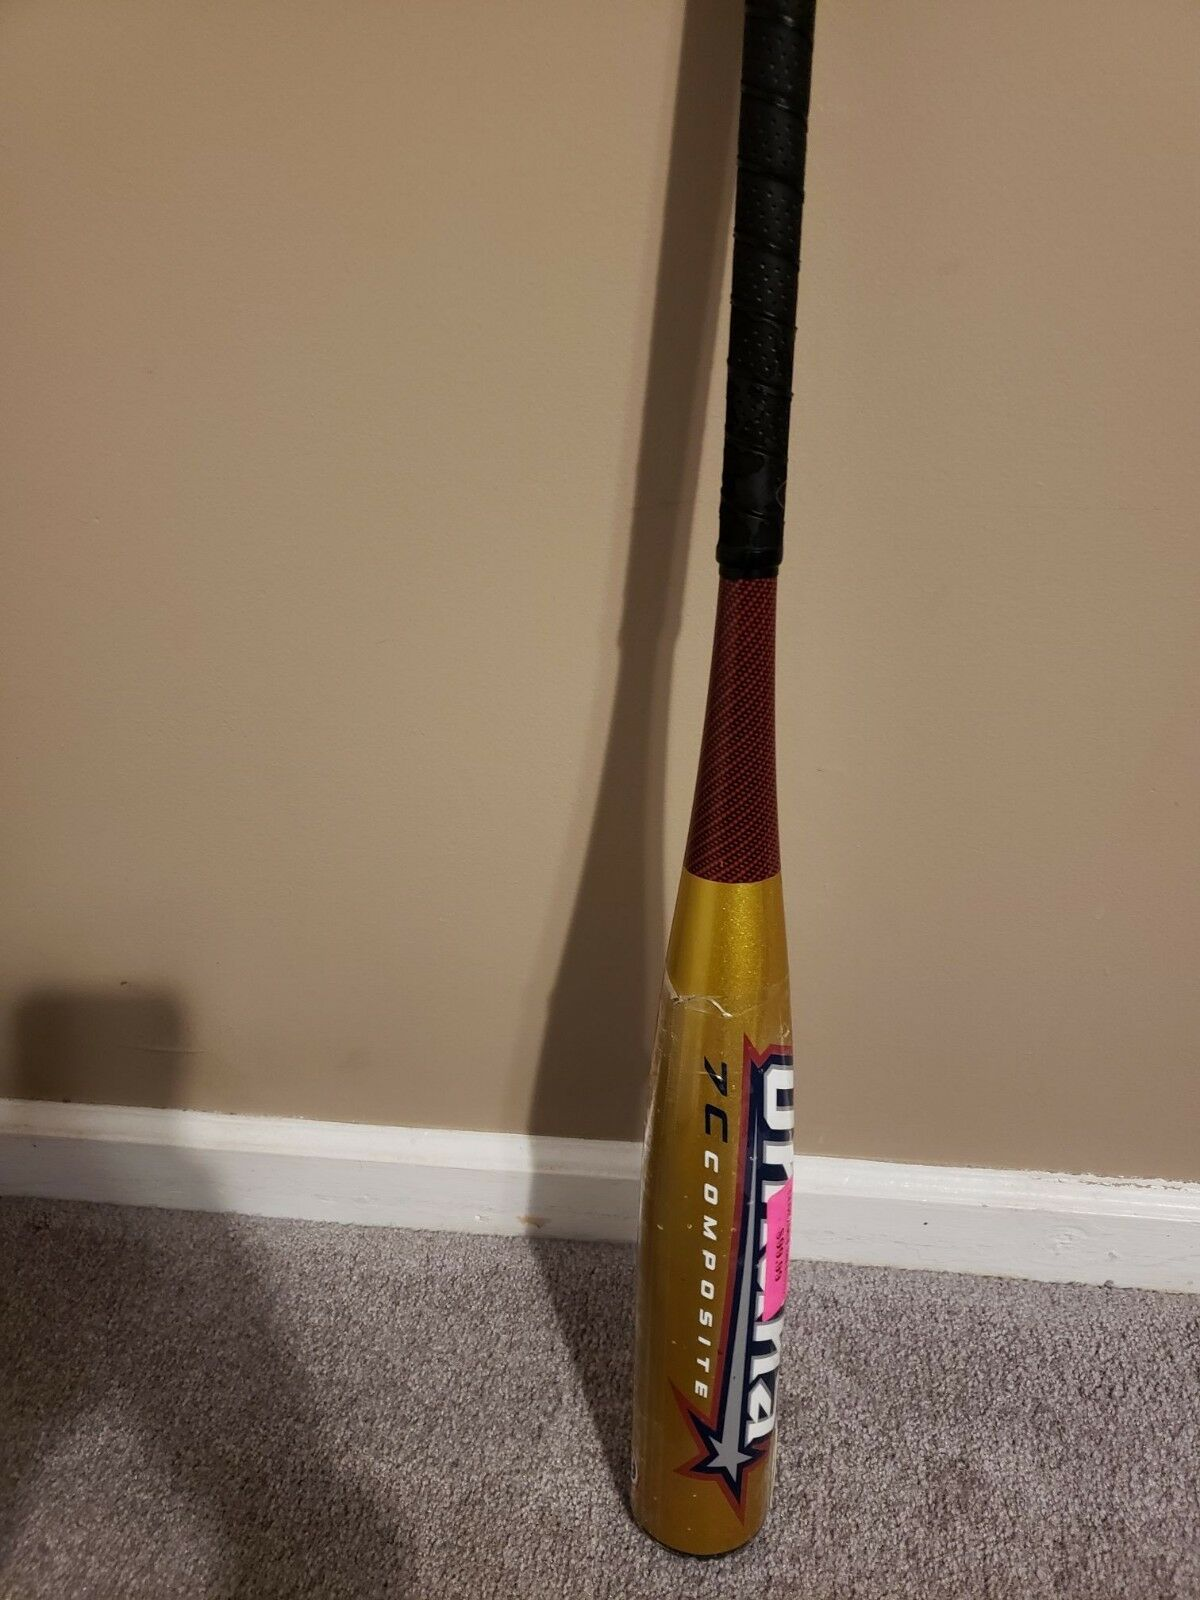 Louisville Omaha Senior League Bat SLS4 32  24oz. Drop 8 New W  Warranty